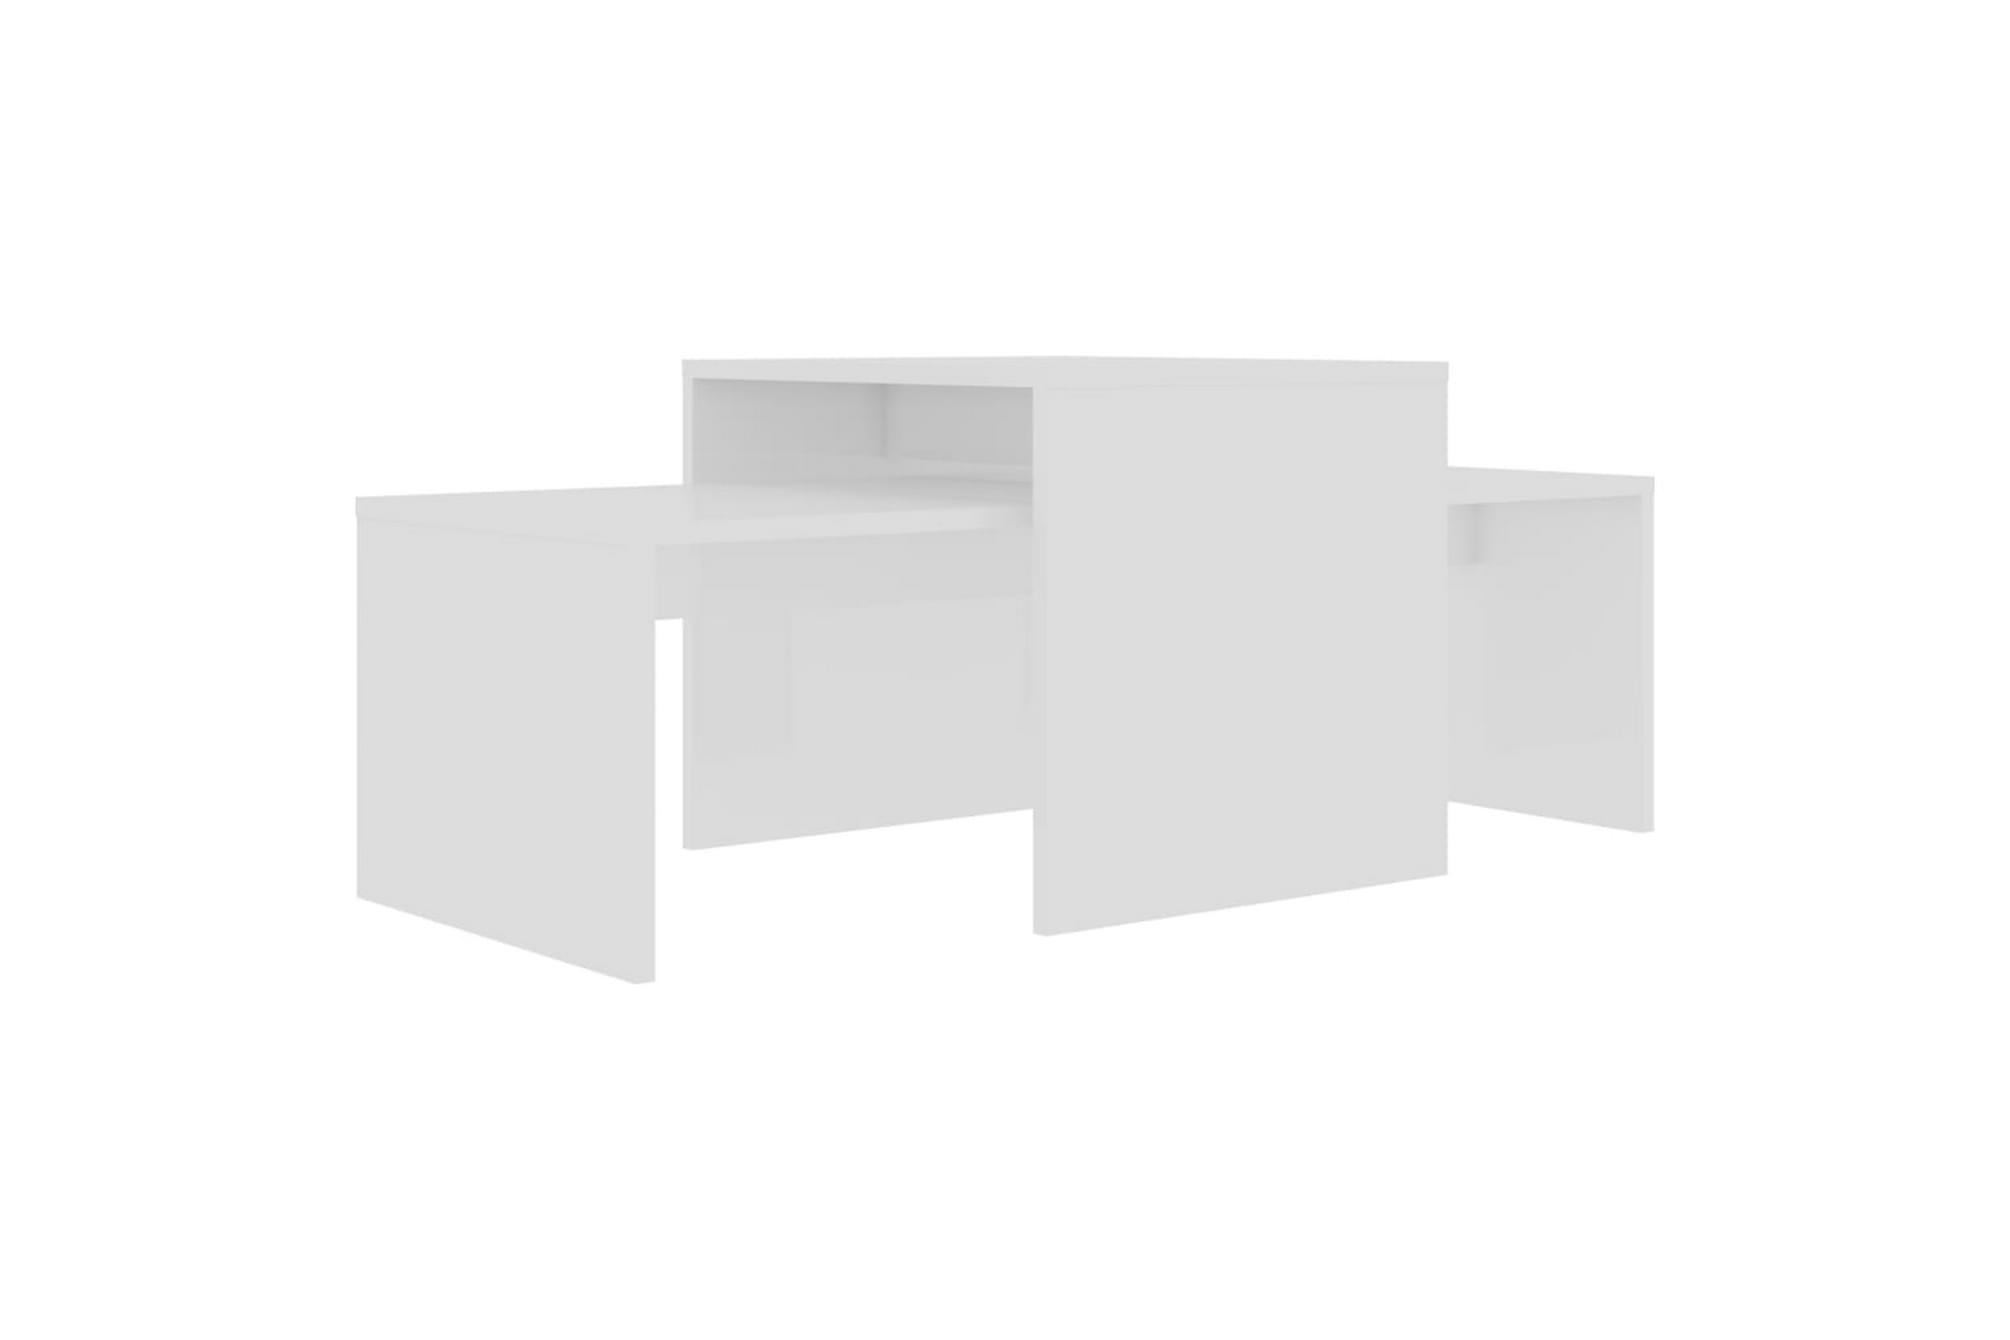 Soffbord set vit högglans 100x48x40 cm spånskiva